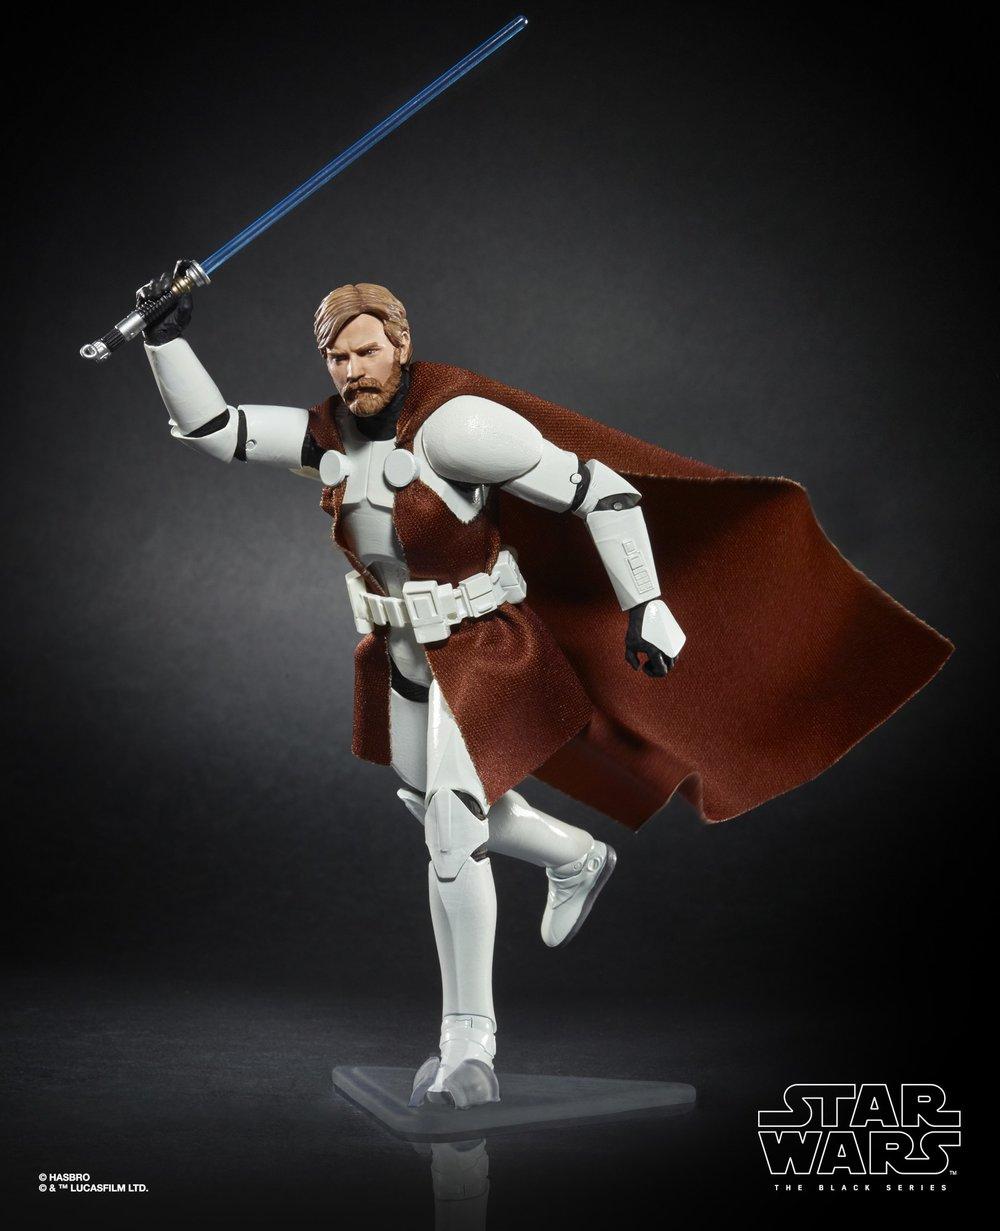 Star-Wars-The-Black-Series-6-inch-Obi-Wan-Kenobi-Clone-Trooper-Armor-Figure-2-Walgreens-Exclusive-Promo-02.jpg